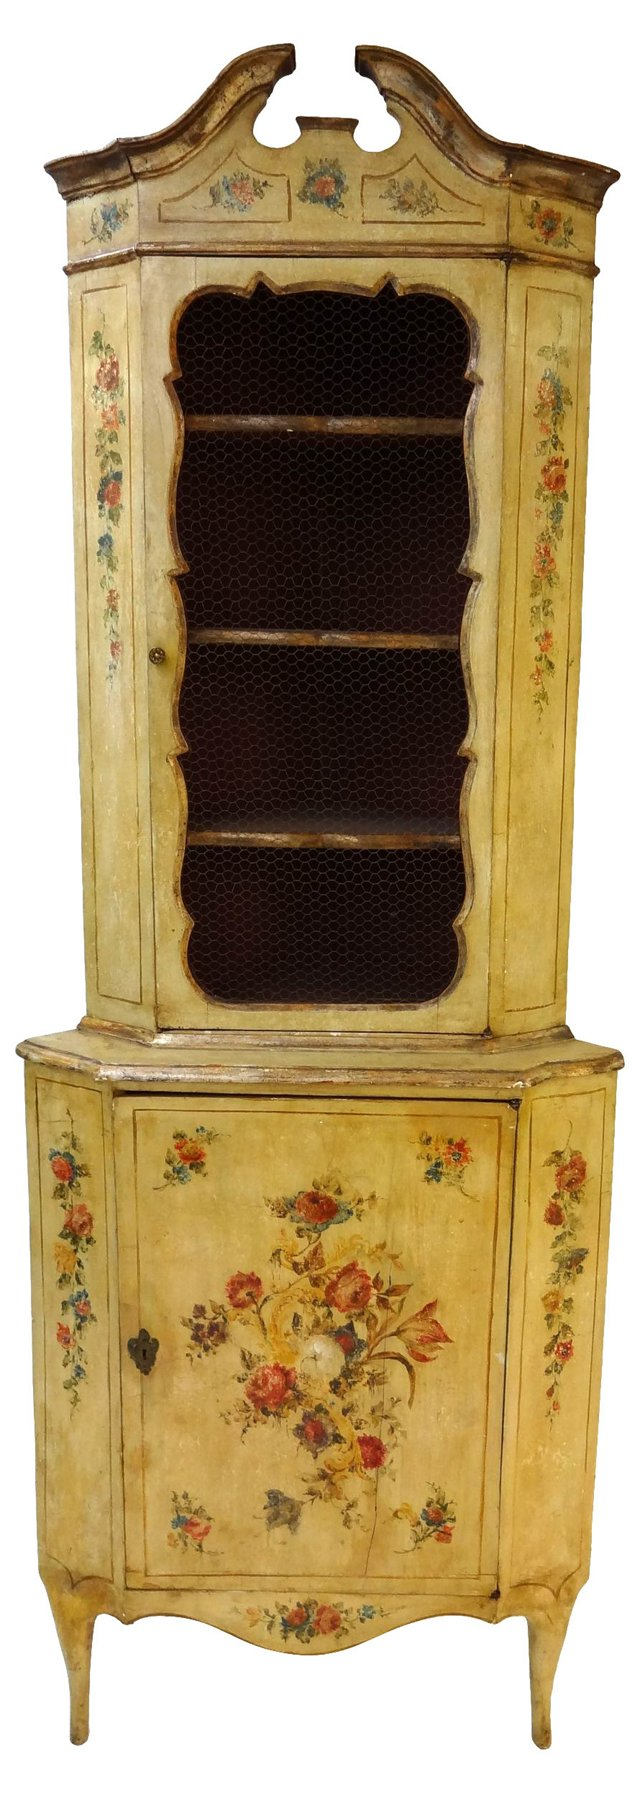 Hand-Painted Italian Corner Cabinet